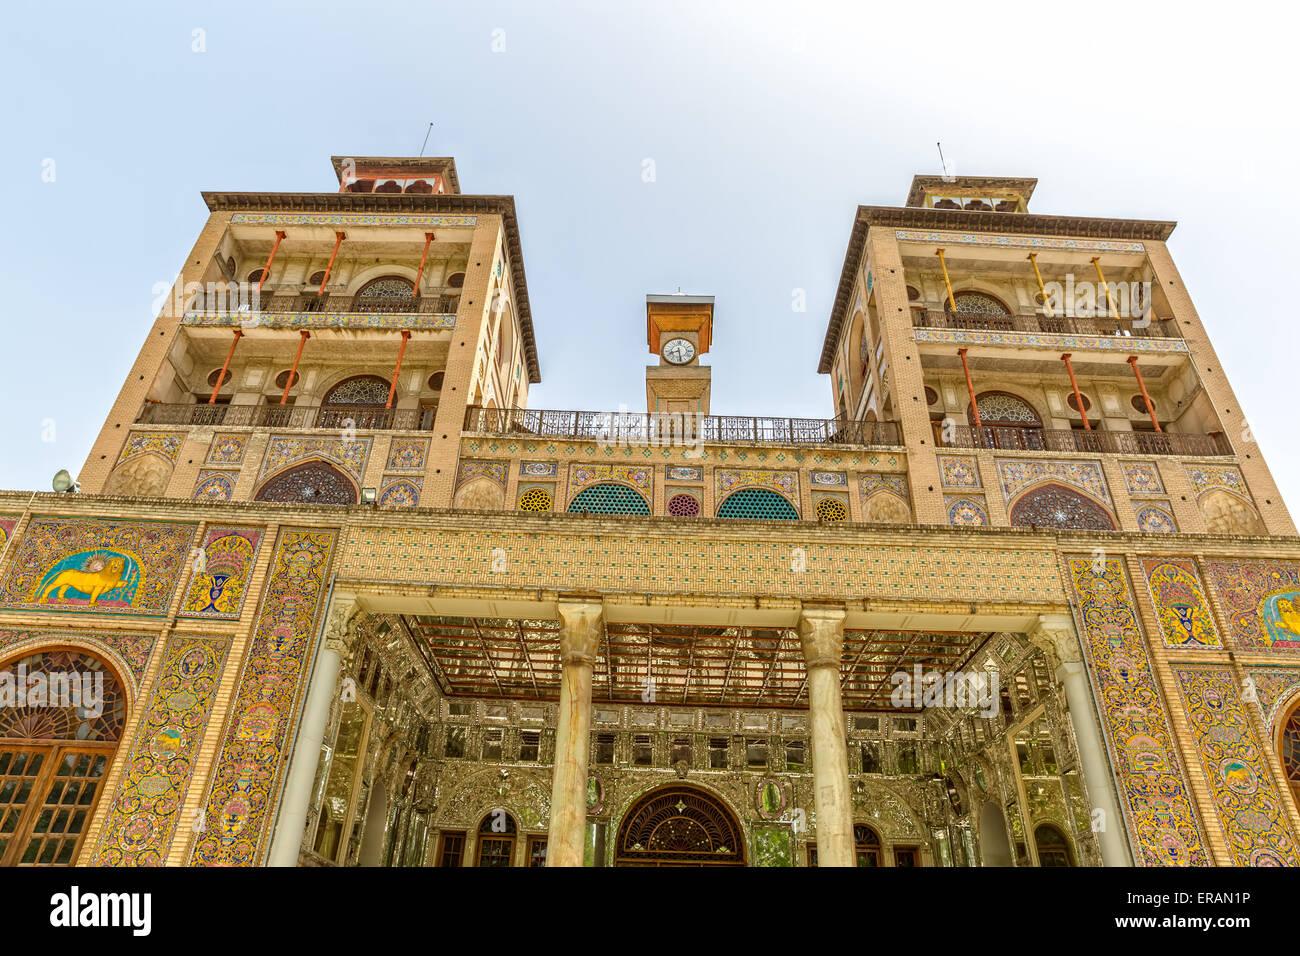 Golestan Palace Towers Edifice of the Sun - Stock Image